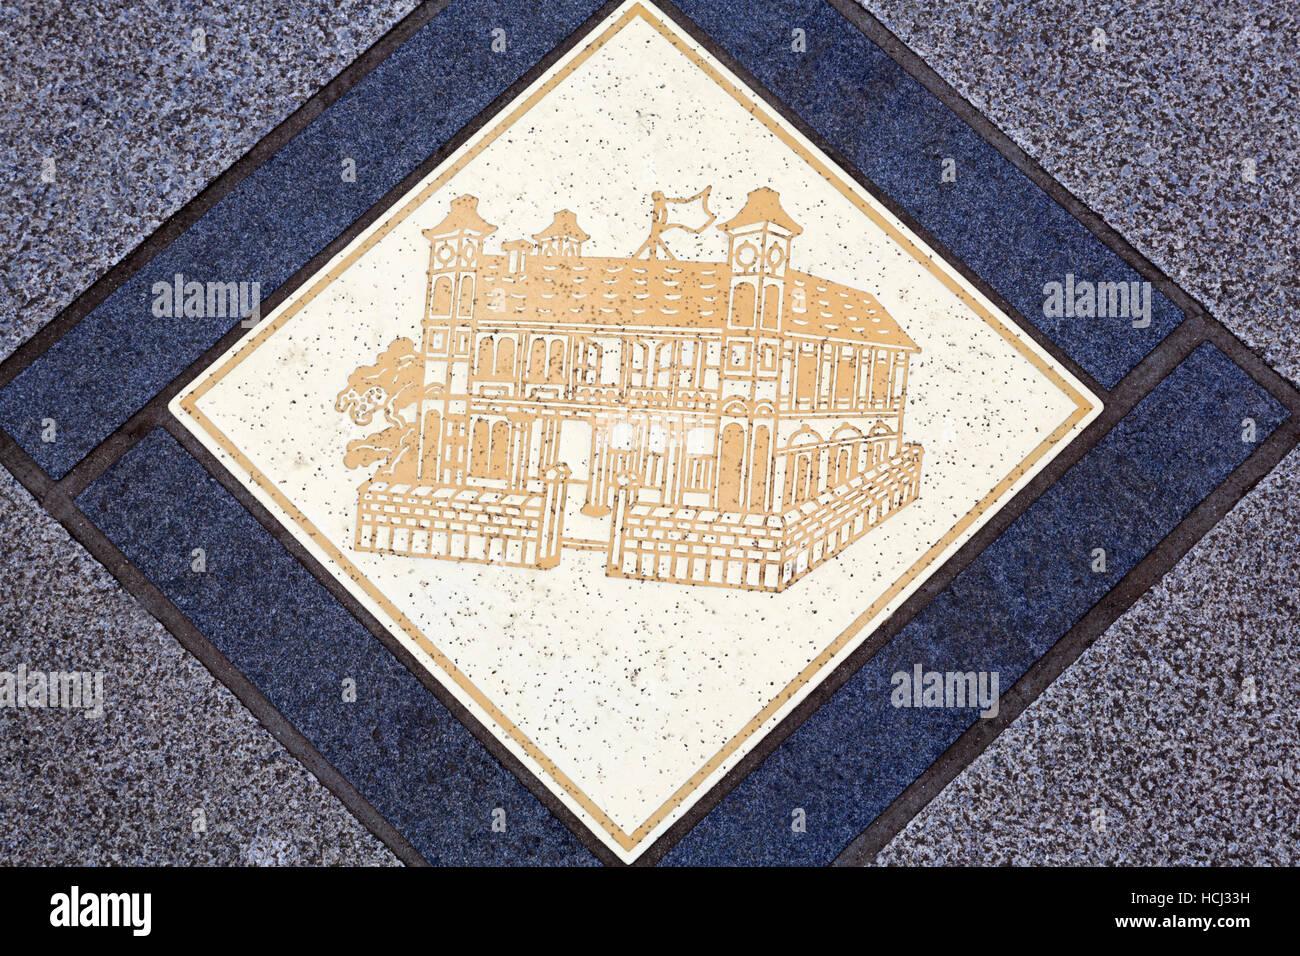 Tile, Yokohama, Honshu Island, Japan, Asia - Stock Image